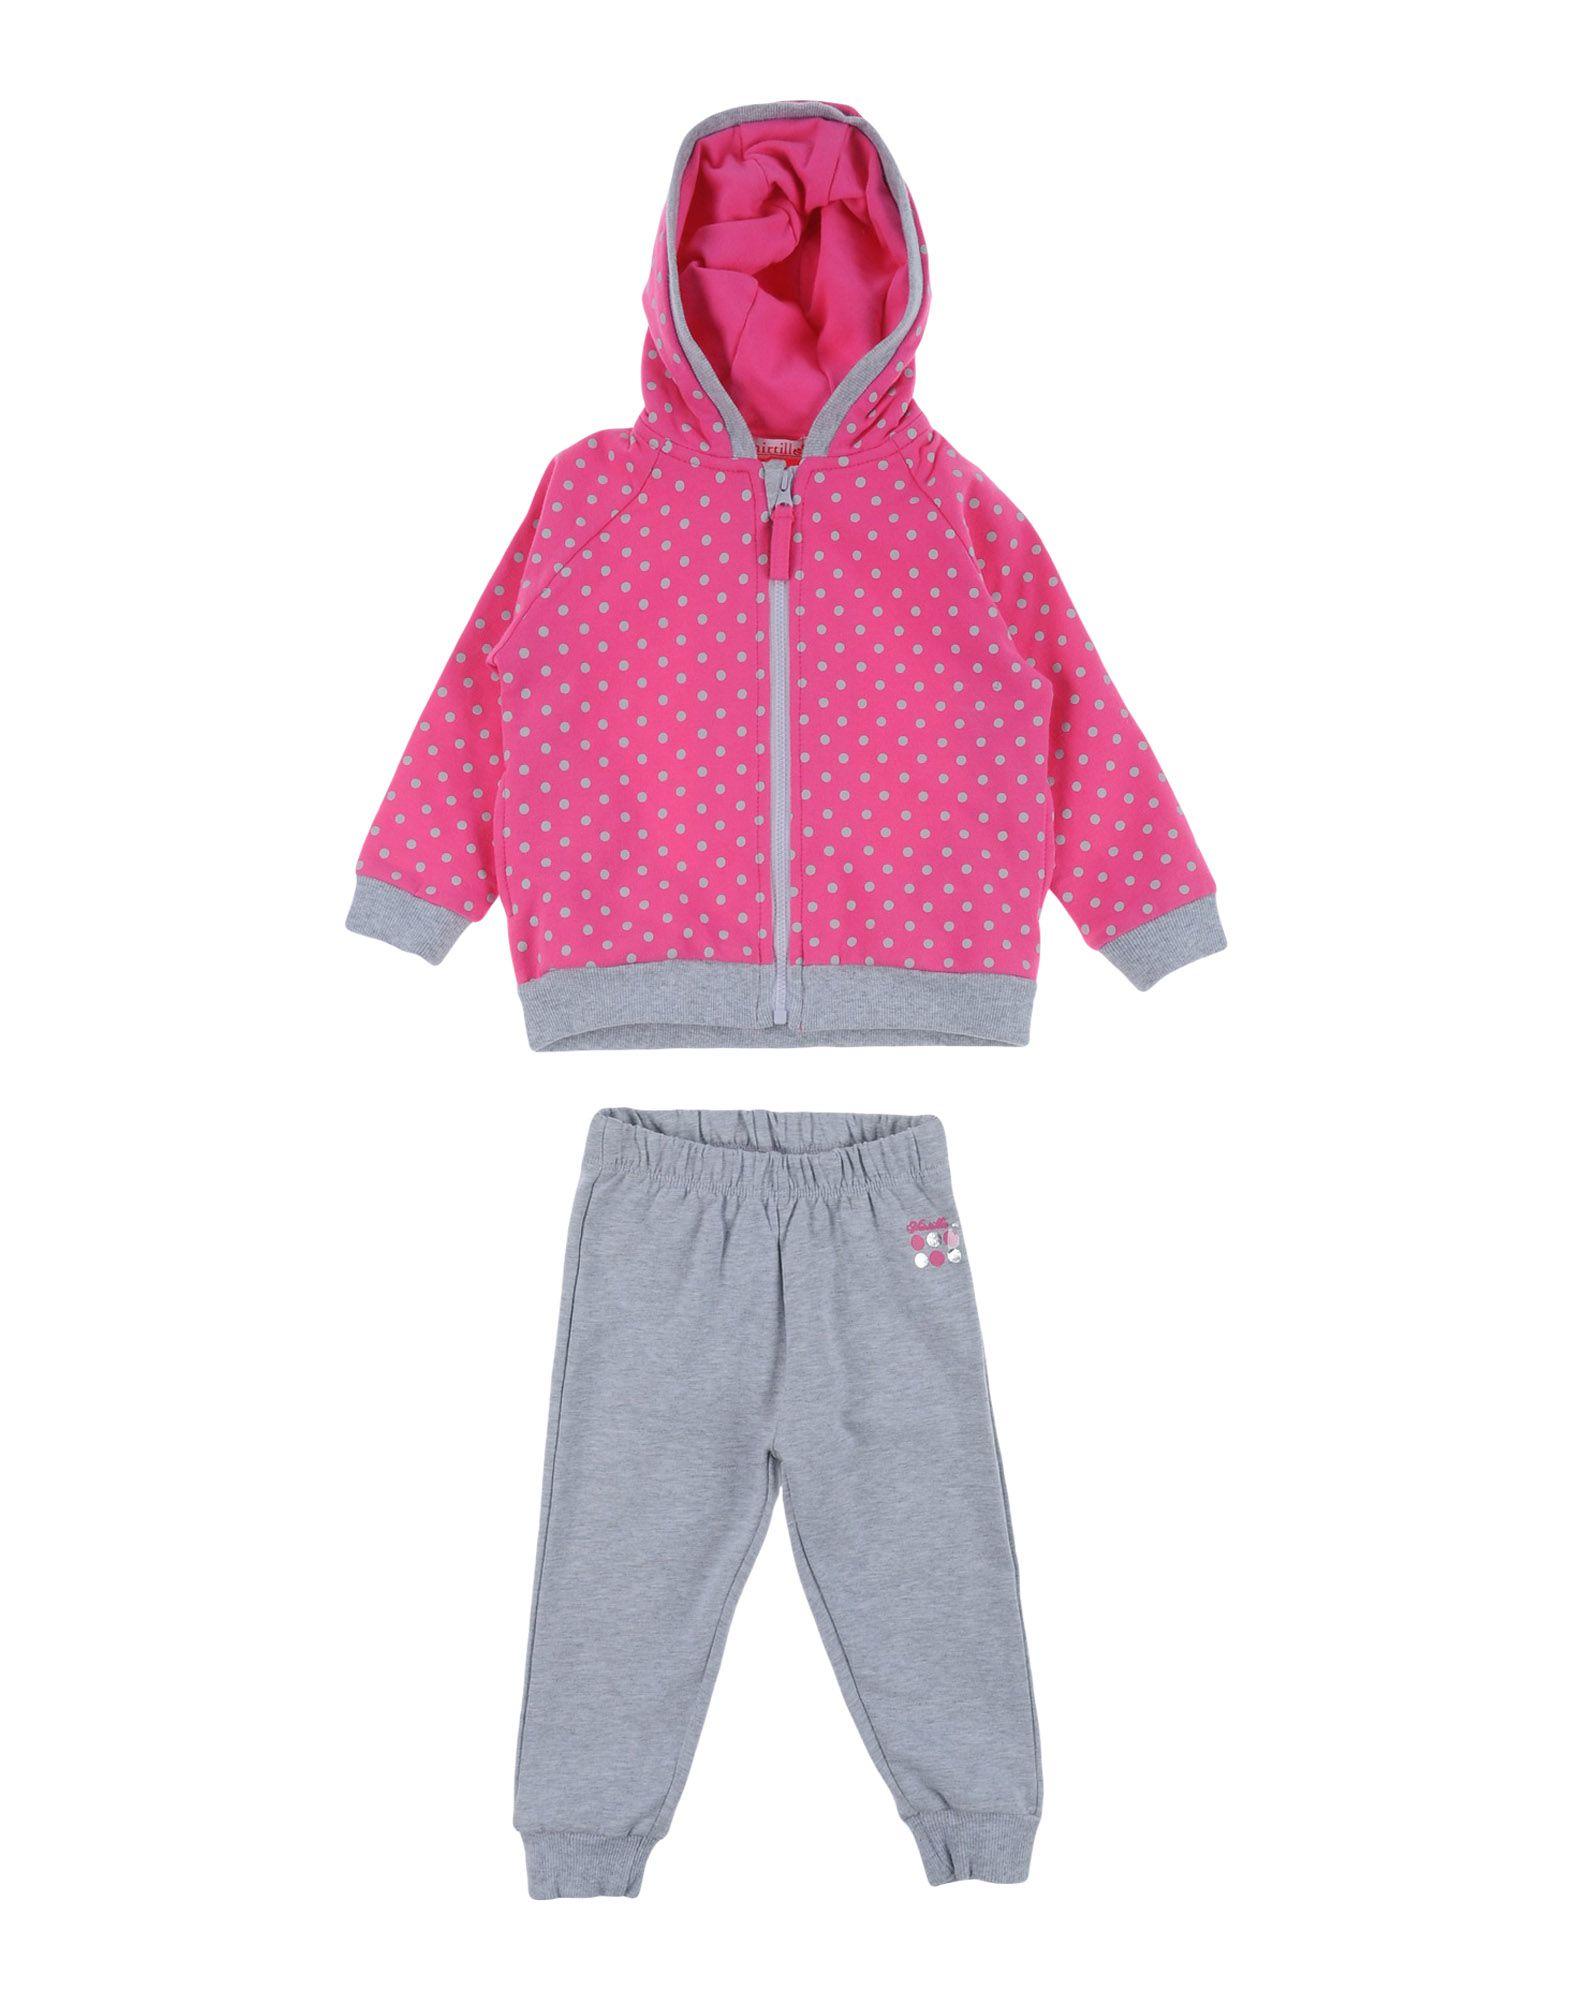 MIRTILLO Baby sweatsuits